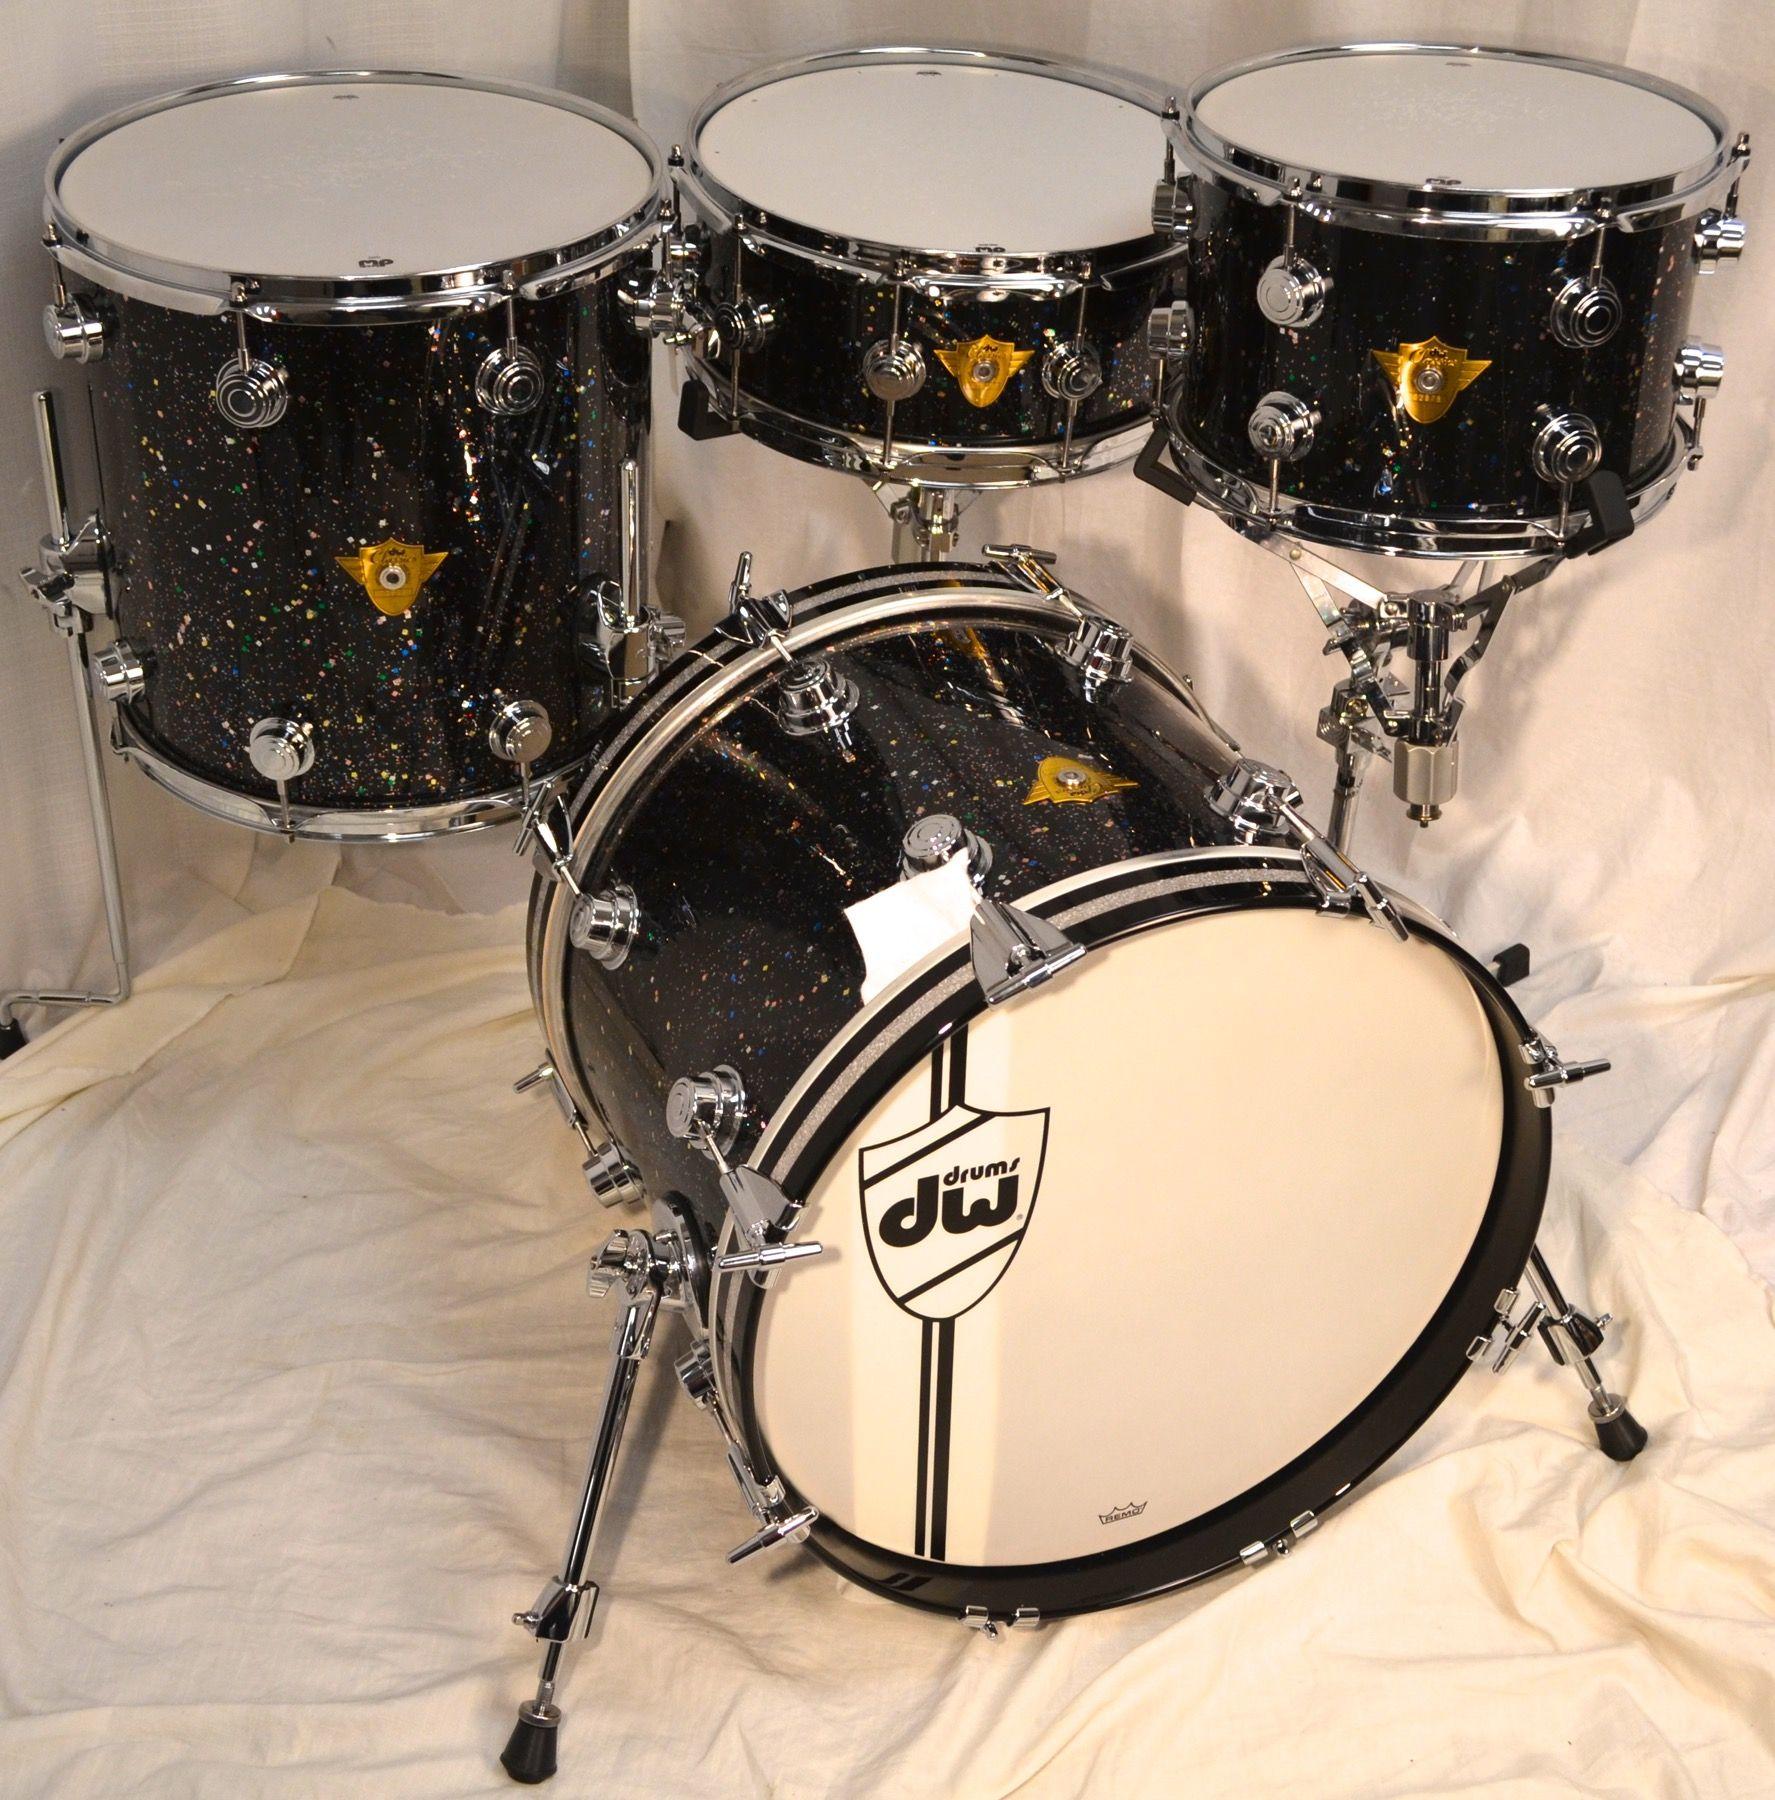 Dw Classic Series Drum Set Mardi Gras Dw Drums In 2019